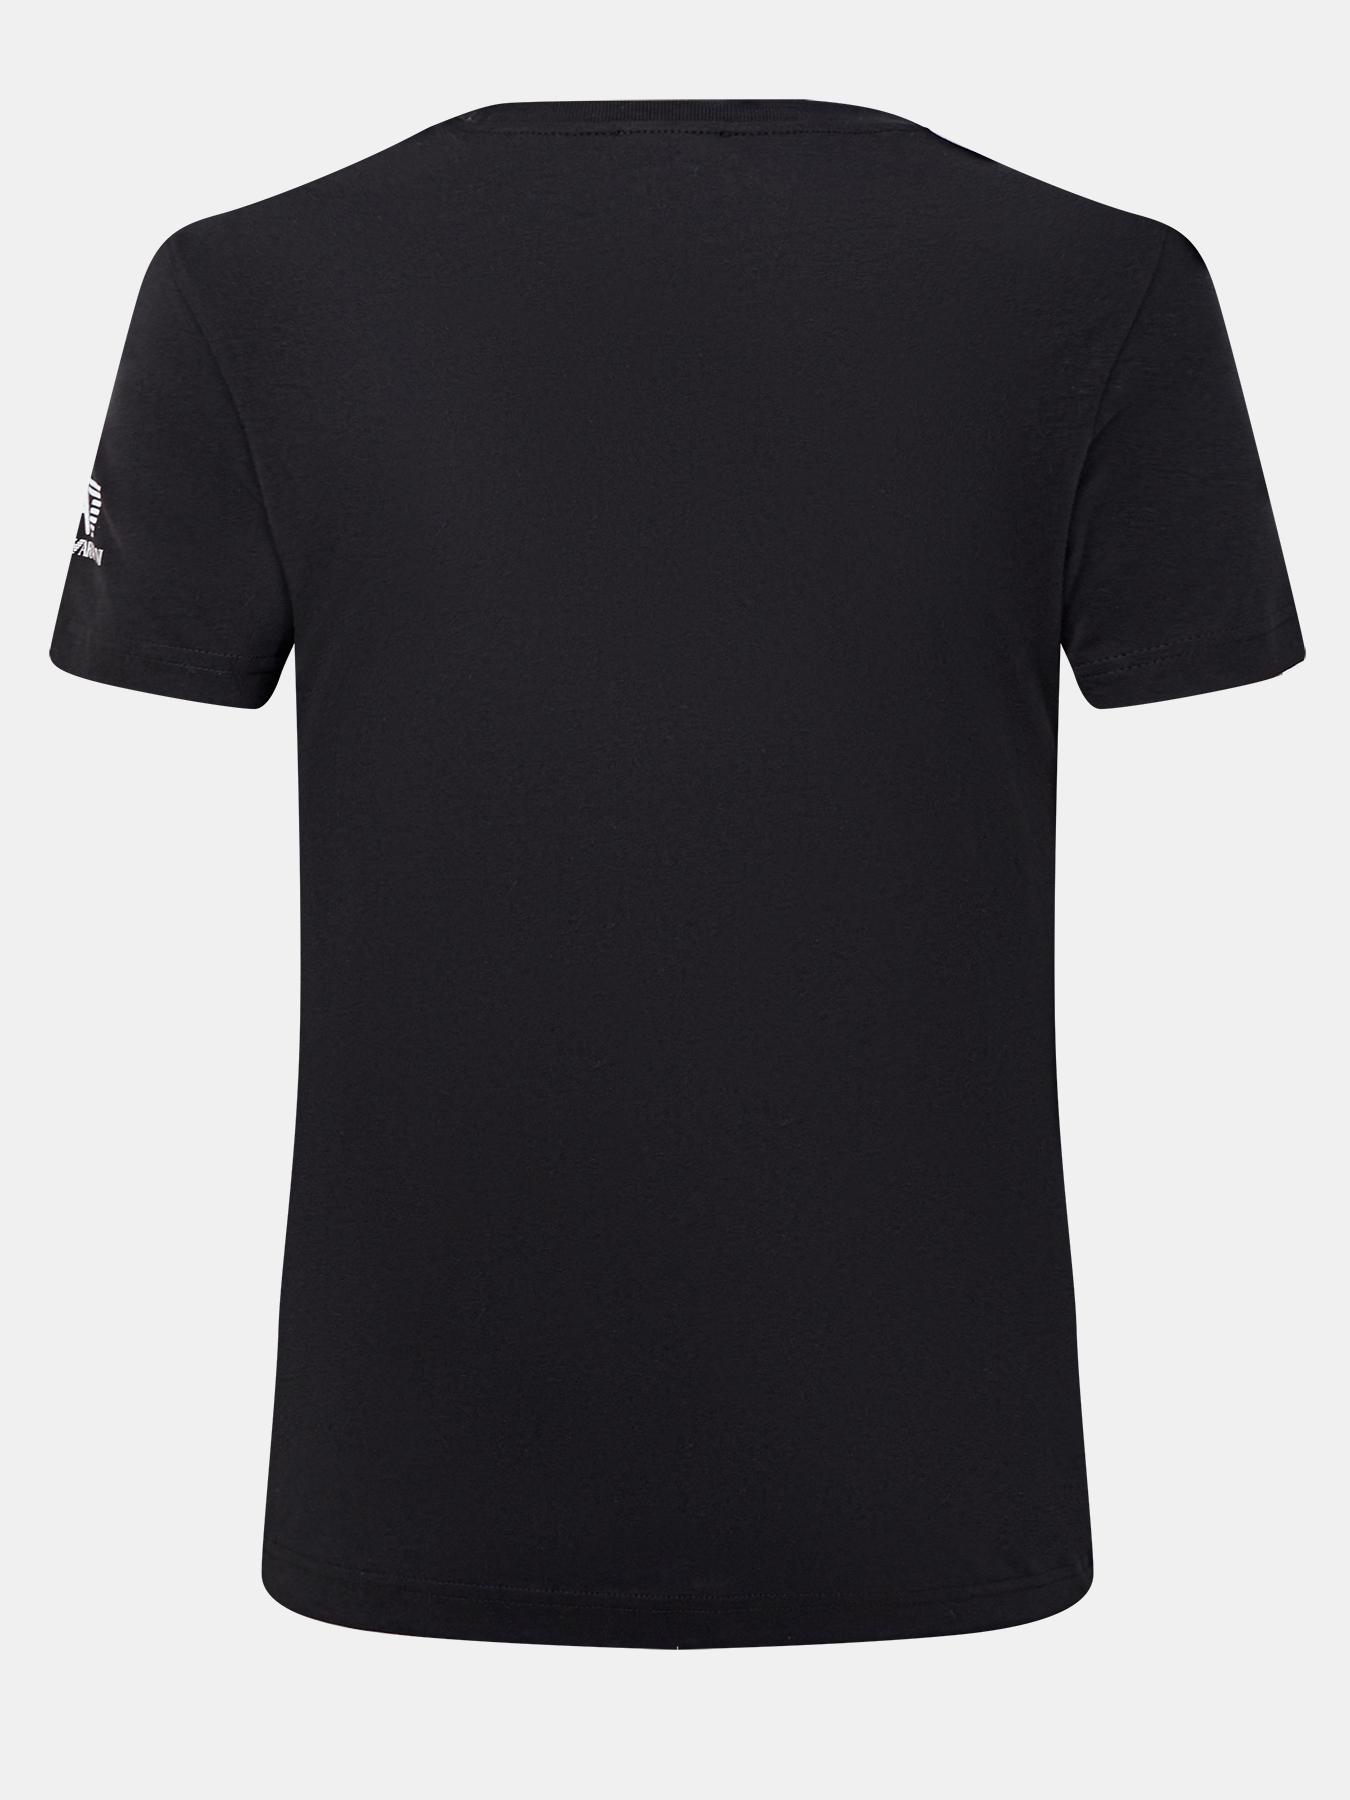 Фуфайка (футболка) EA7 Emporio Armani Футболка футболка ea7 ea7 ea002emdqxl8